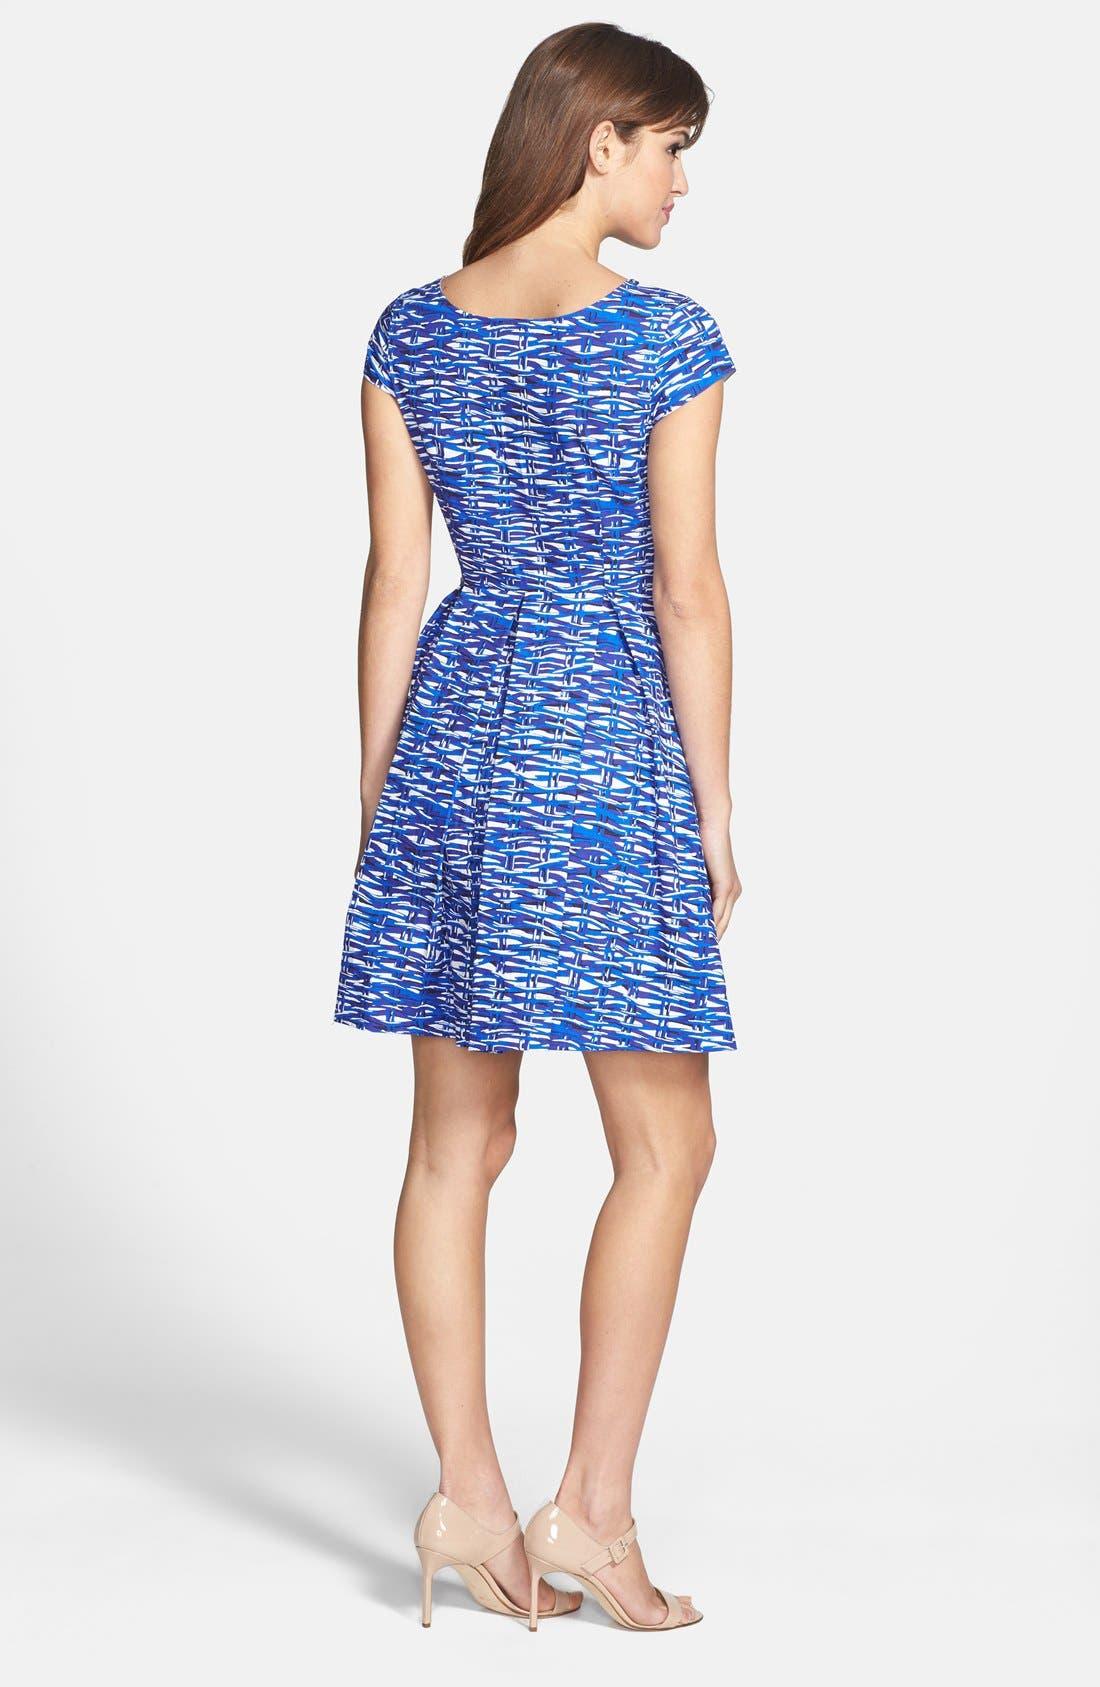 Alternate Image 3  - Felicity & Coco Print Cotton Fit & Flare Dress (Regular & Petite) (Nordstrom Exclusive)